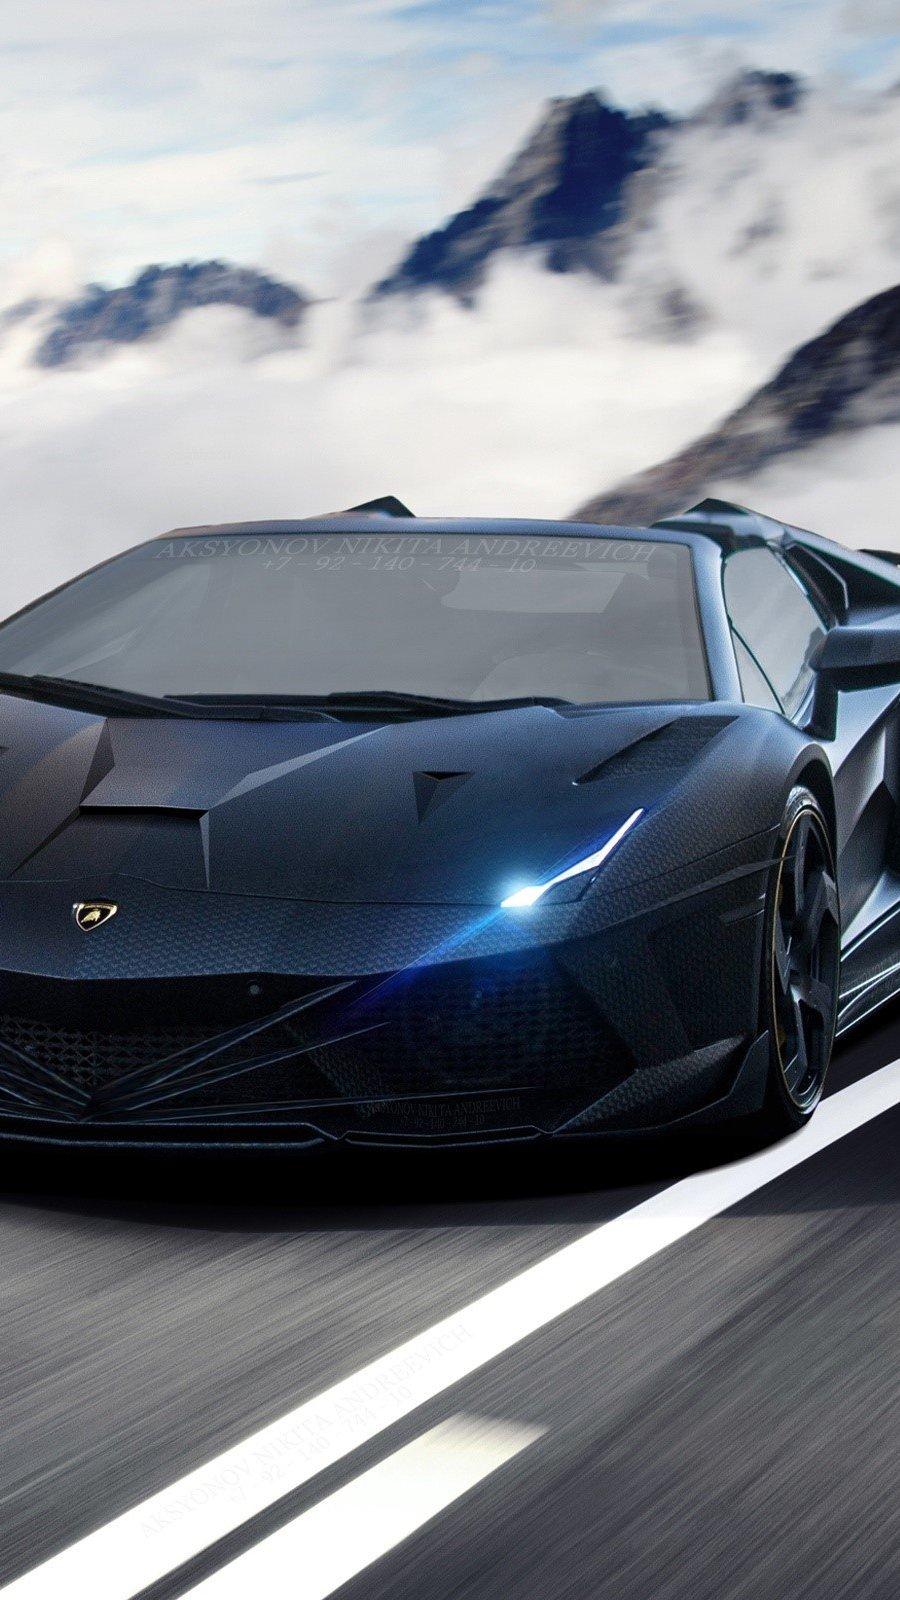 Wallpaper Insane Lamborghini Aventador Vertical